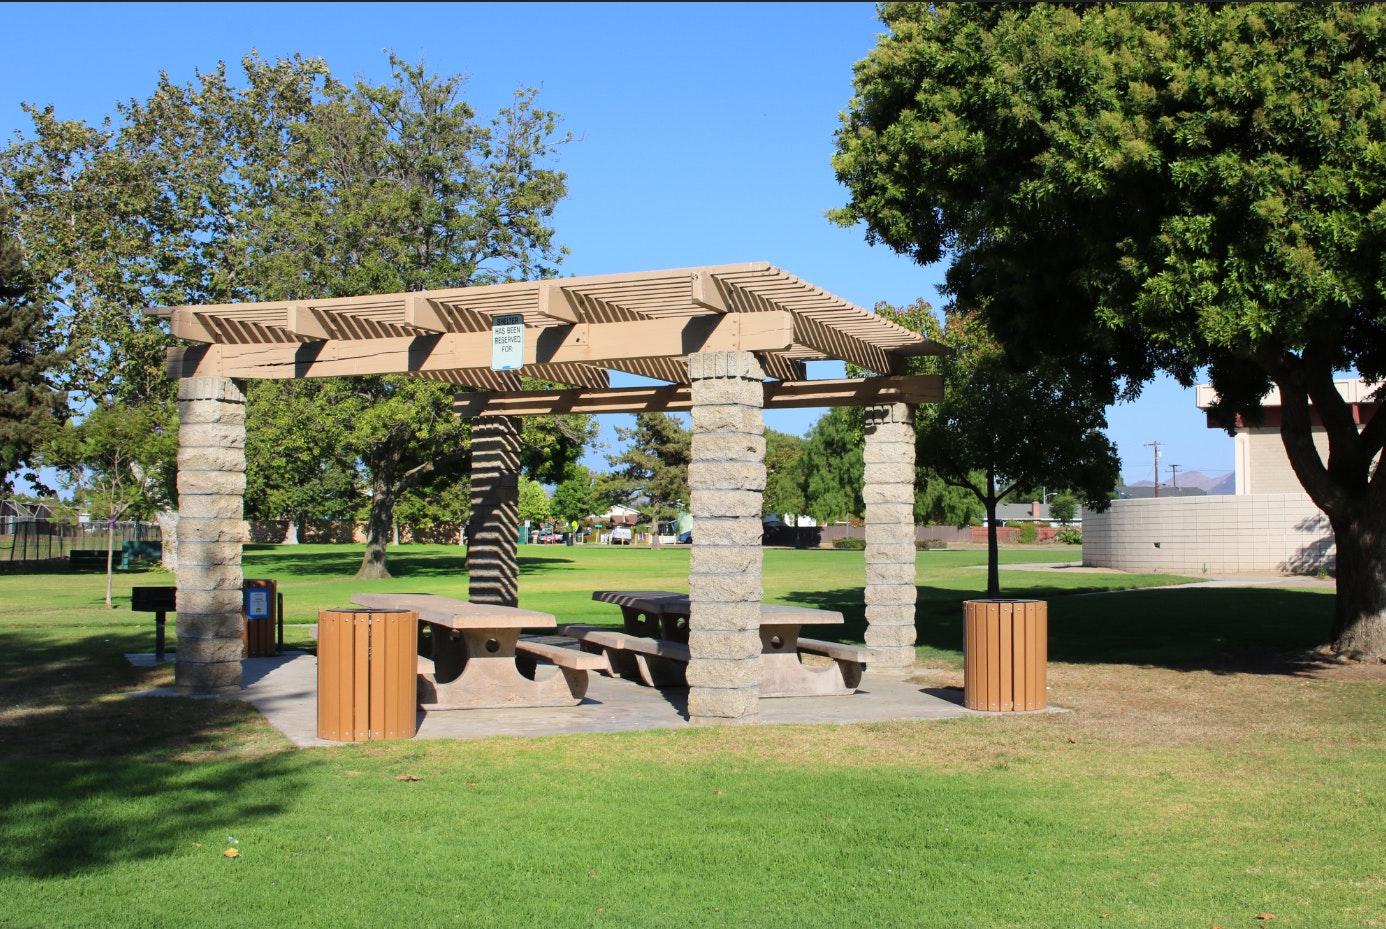 Community Center Park - picnic shelter